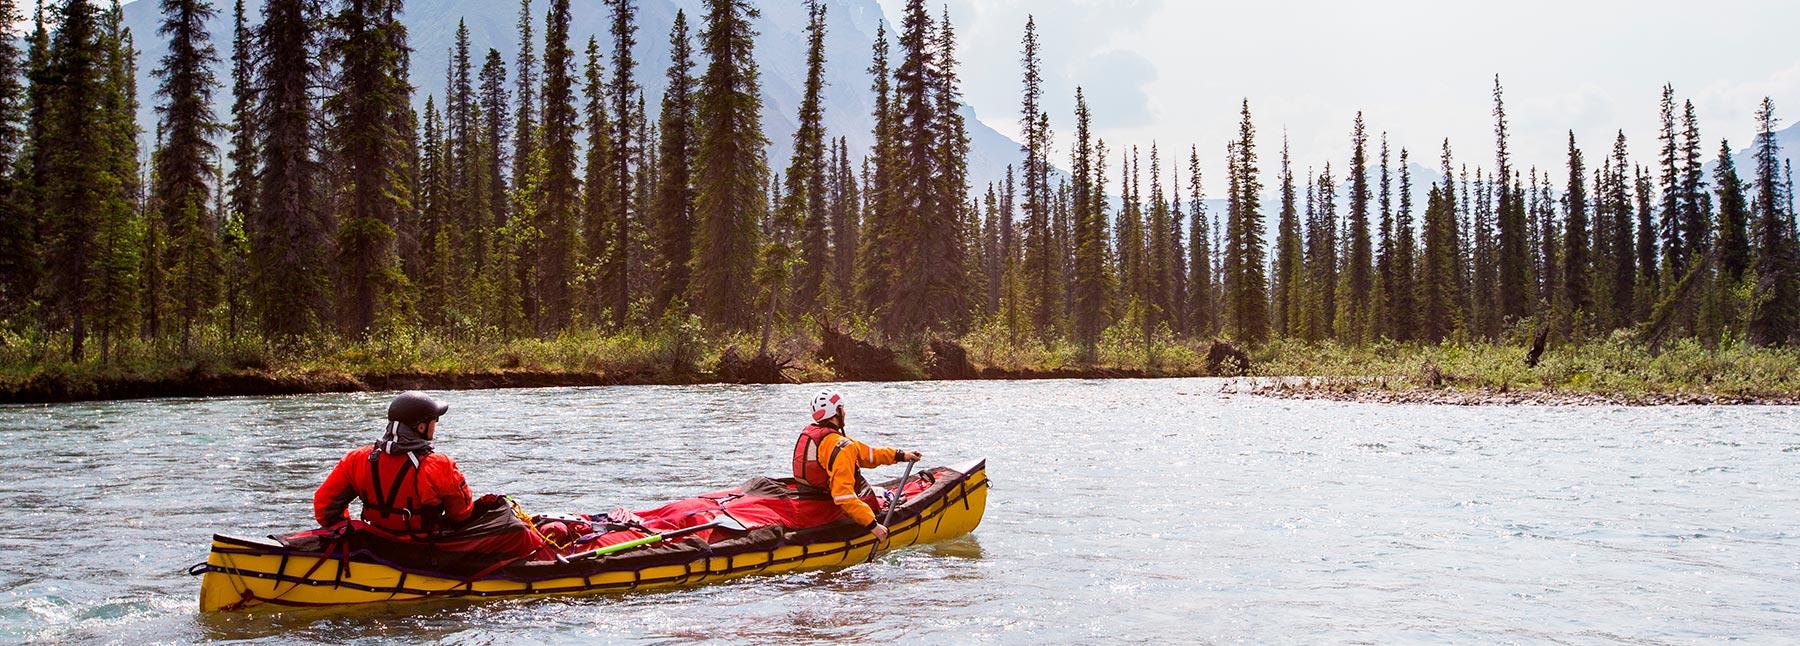 Yukon_River_shutterstock_469615094